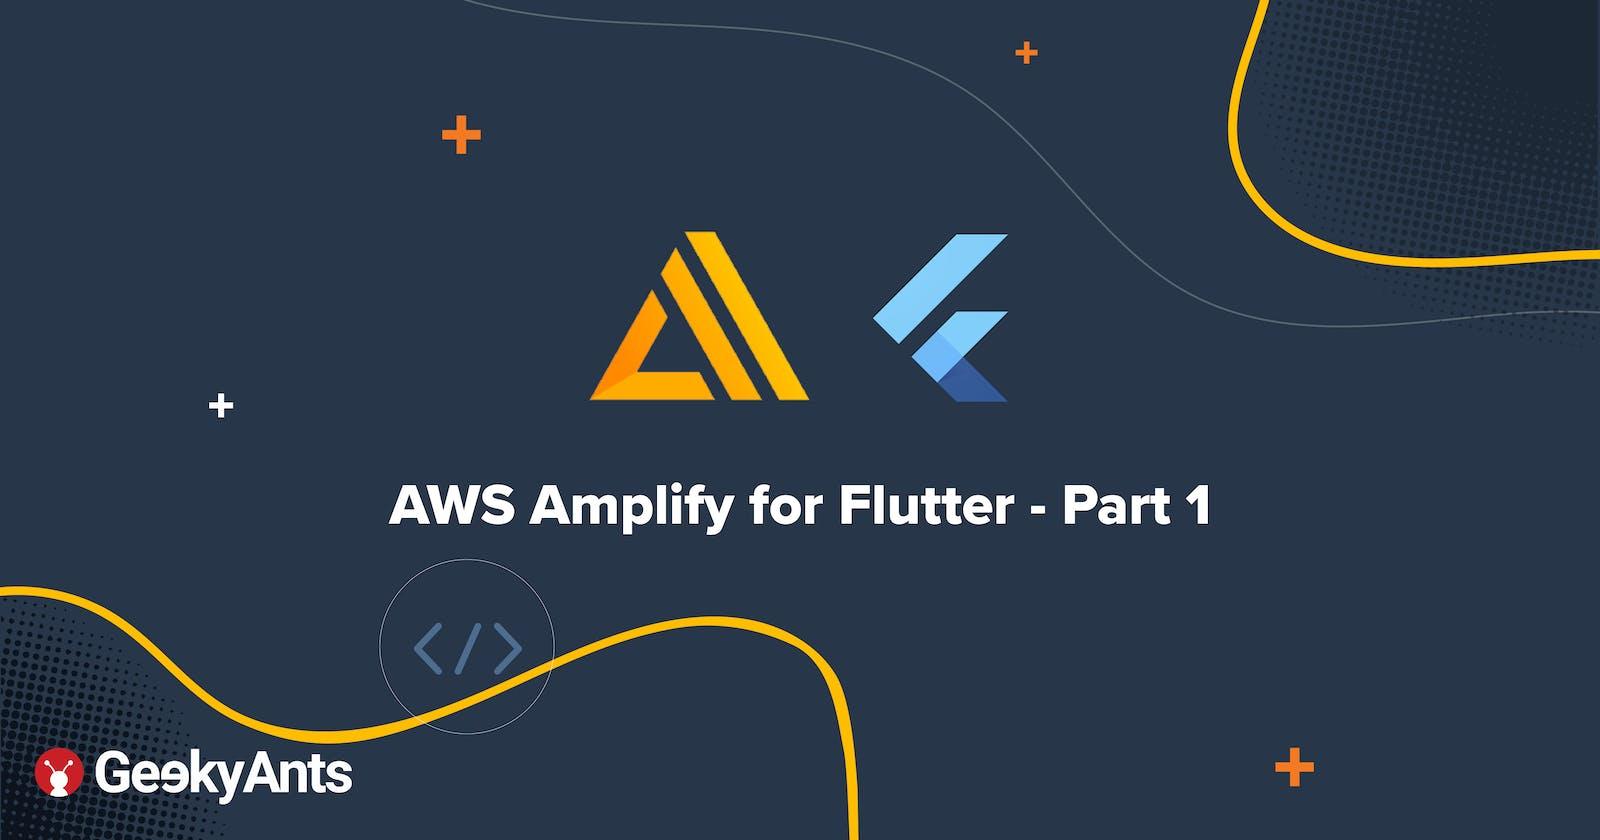 AWS Amplify for Flutter - Part 1